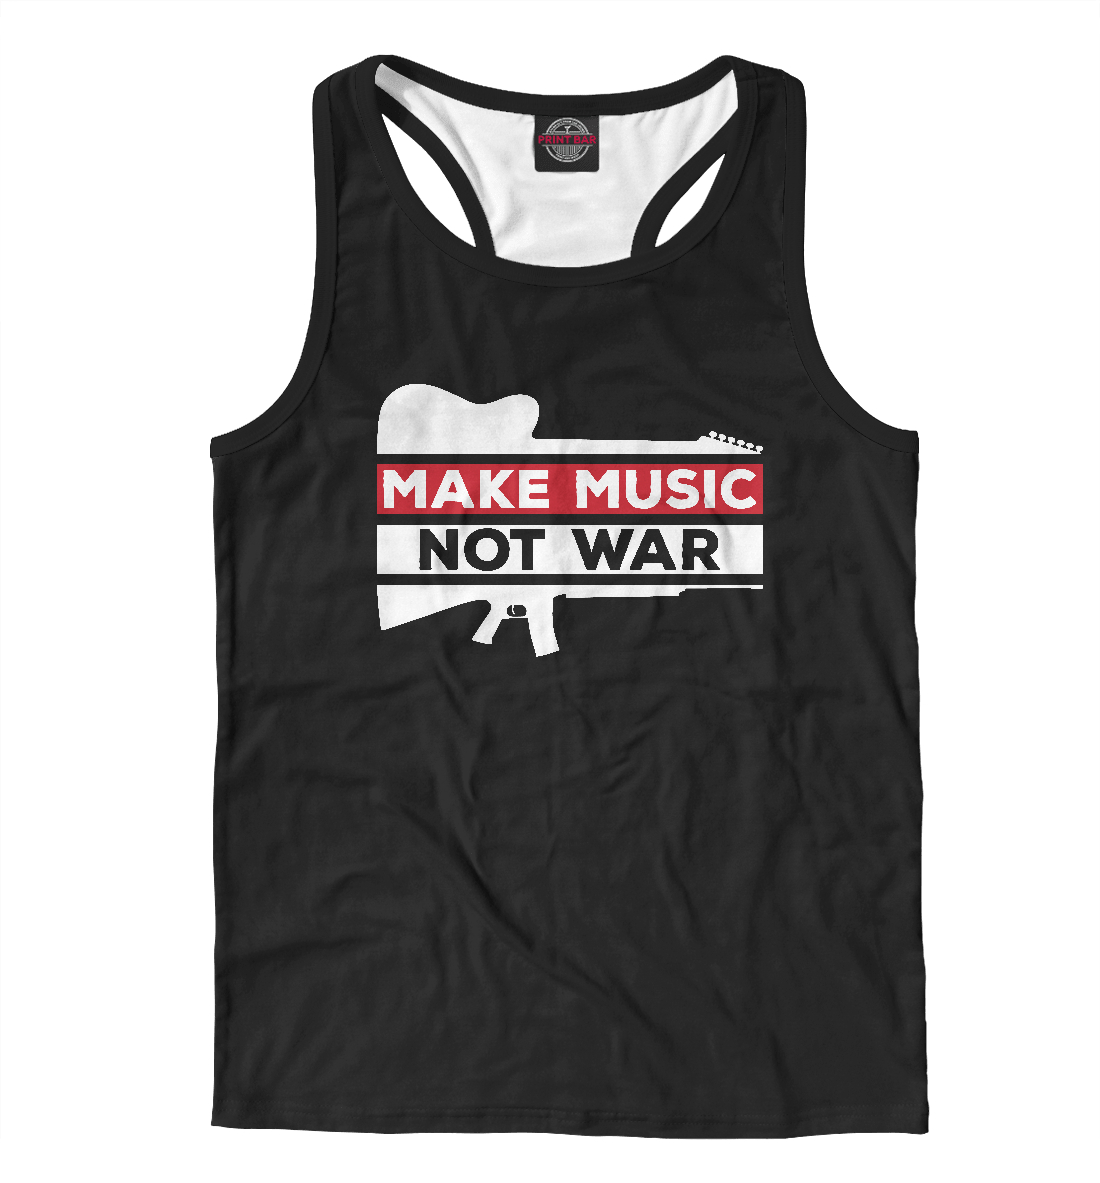 Купить Make Music not war, Printbar, Майки борцовки, MZK-815068-mayb-2